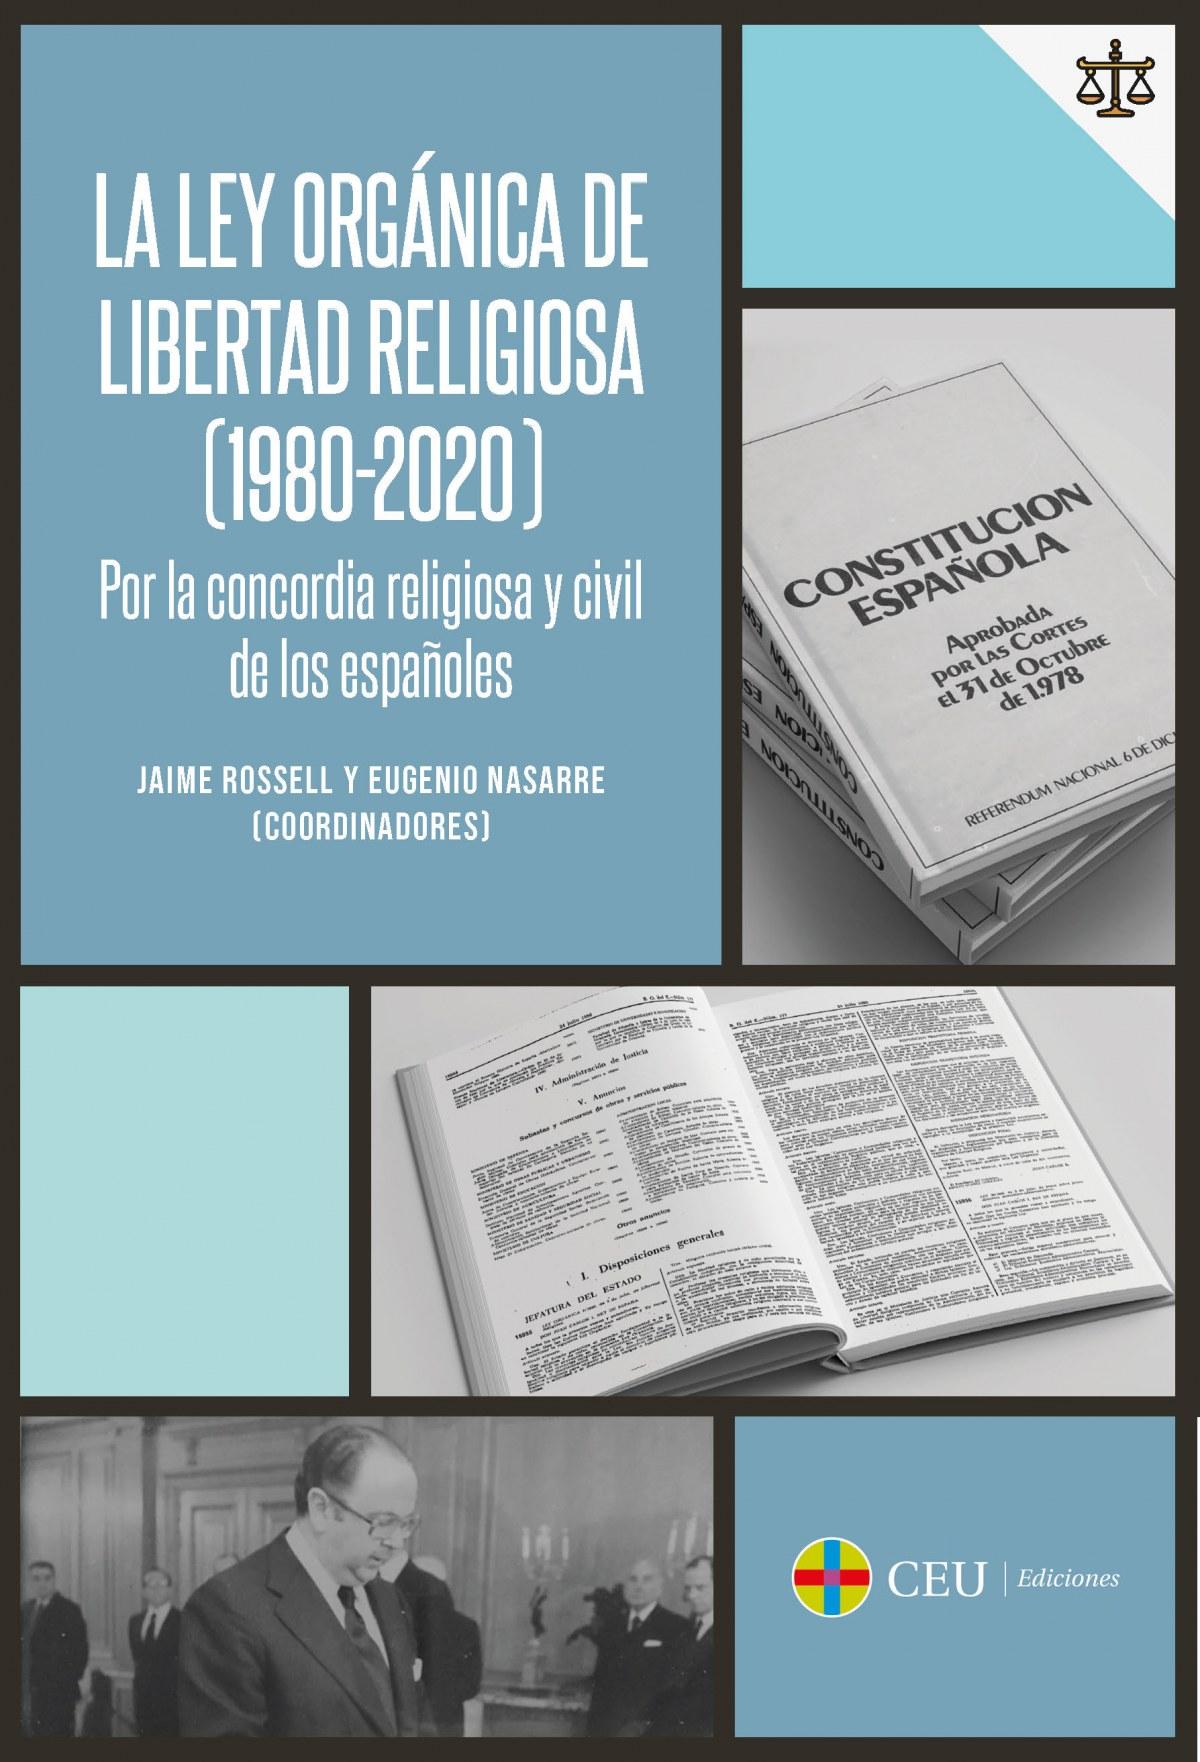 La Ley Orgánica de Libertad Religiosa (1980-2020) Por la concordi 9788417385866